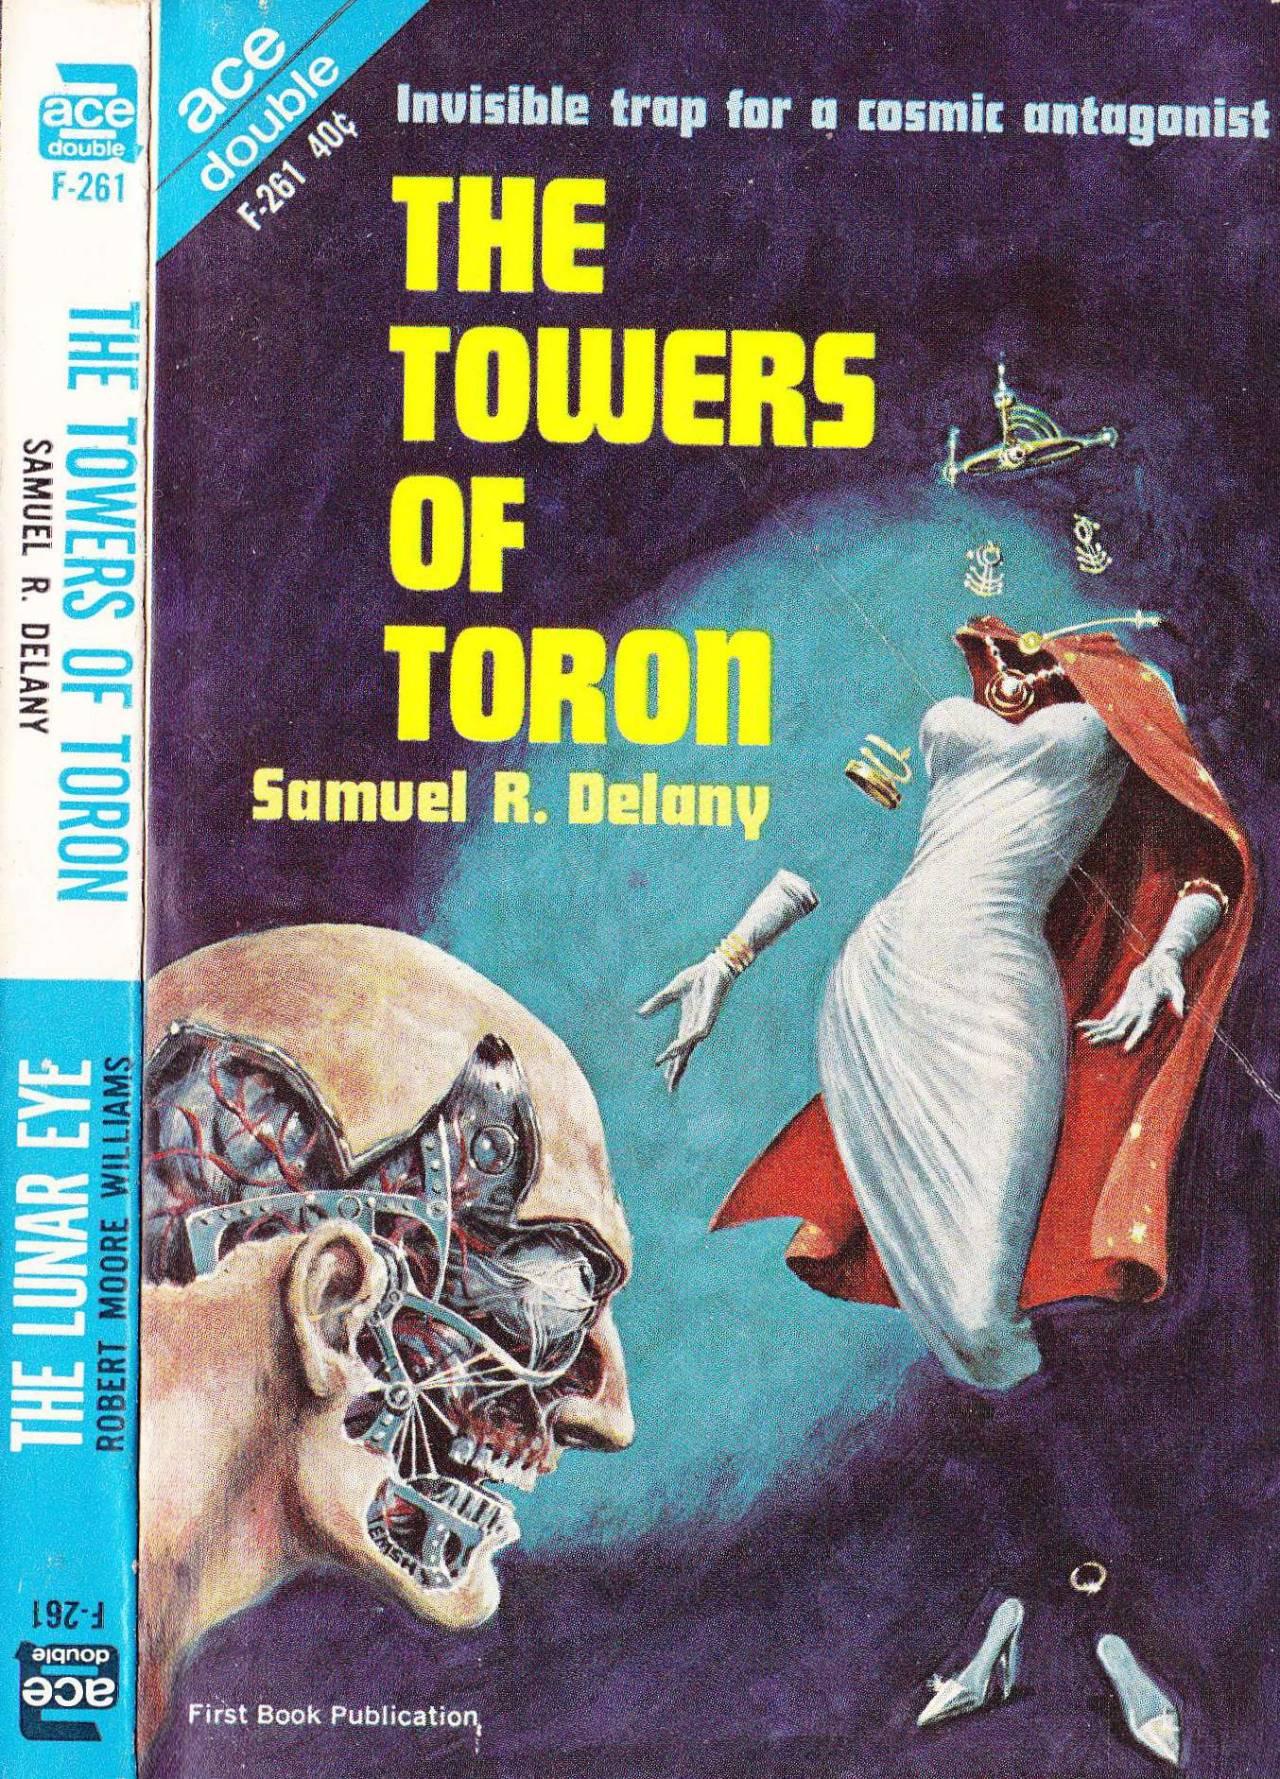 Retro-Futuristic Surrealism: The Best in Vintage Sci-Fi Book